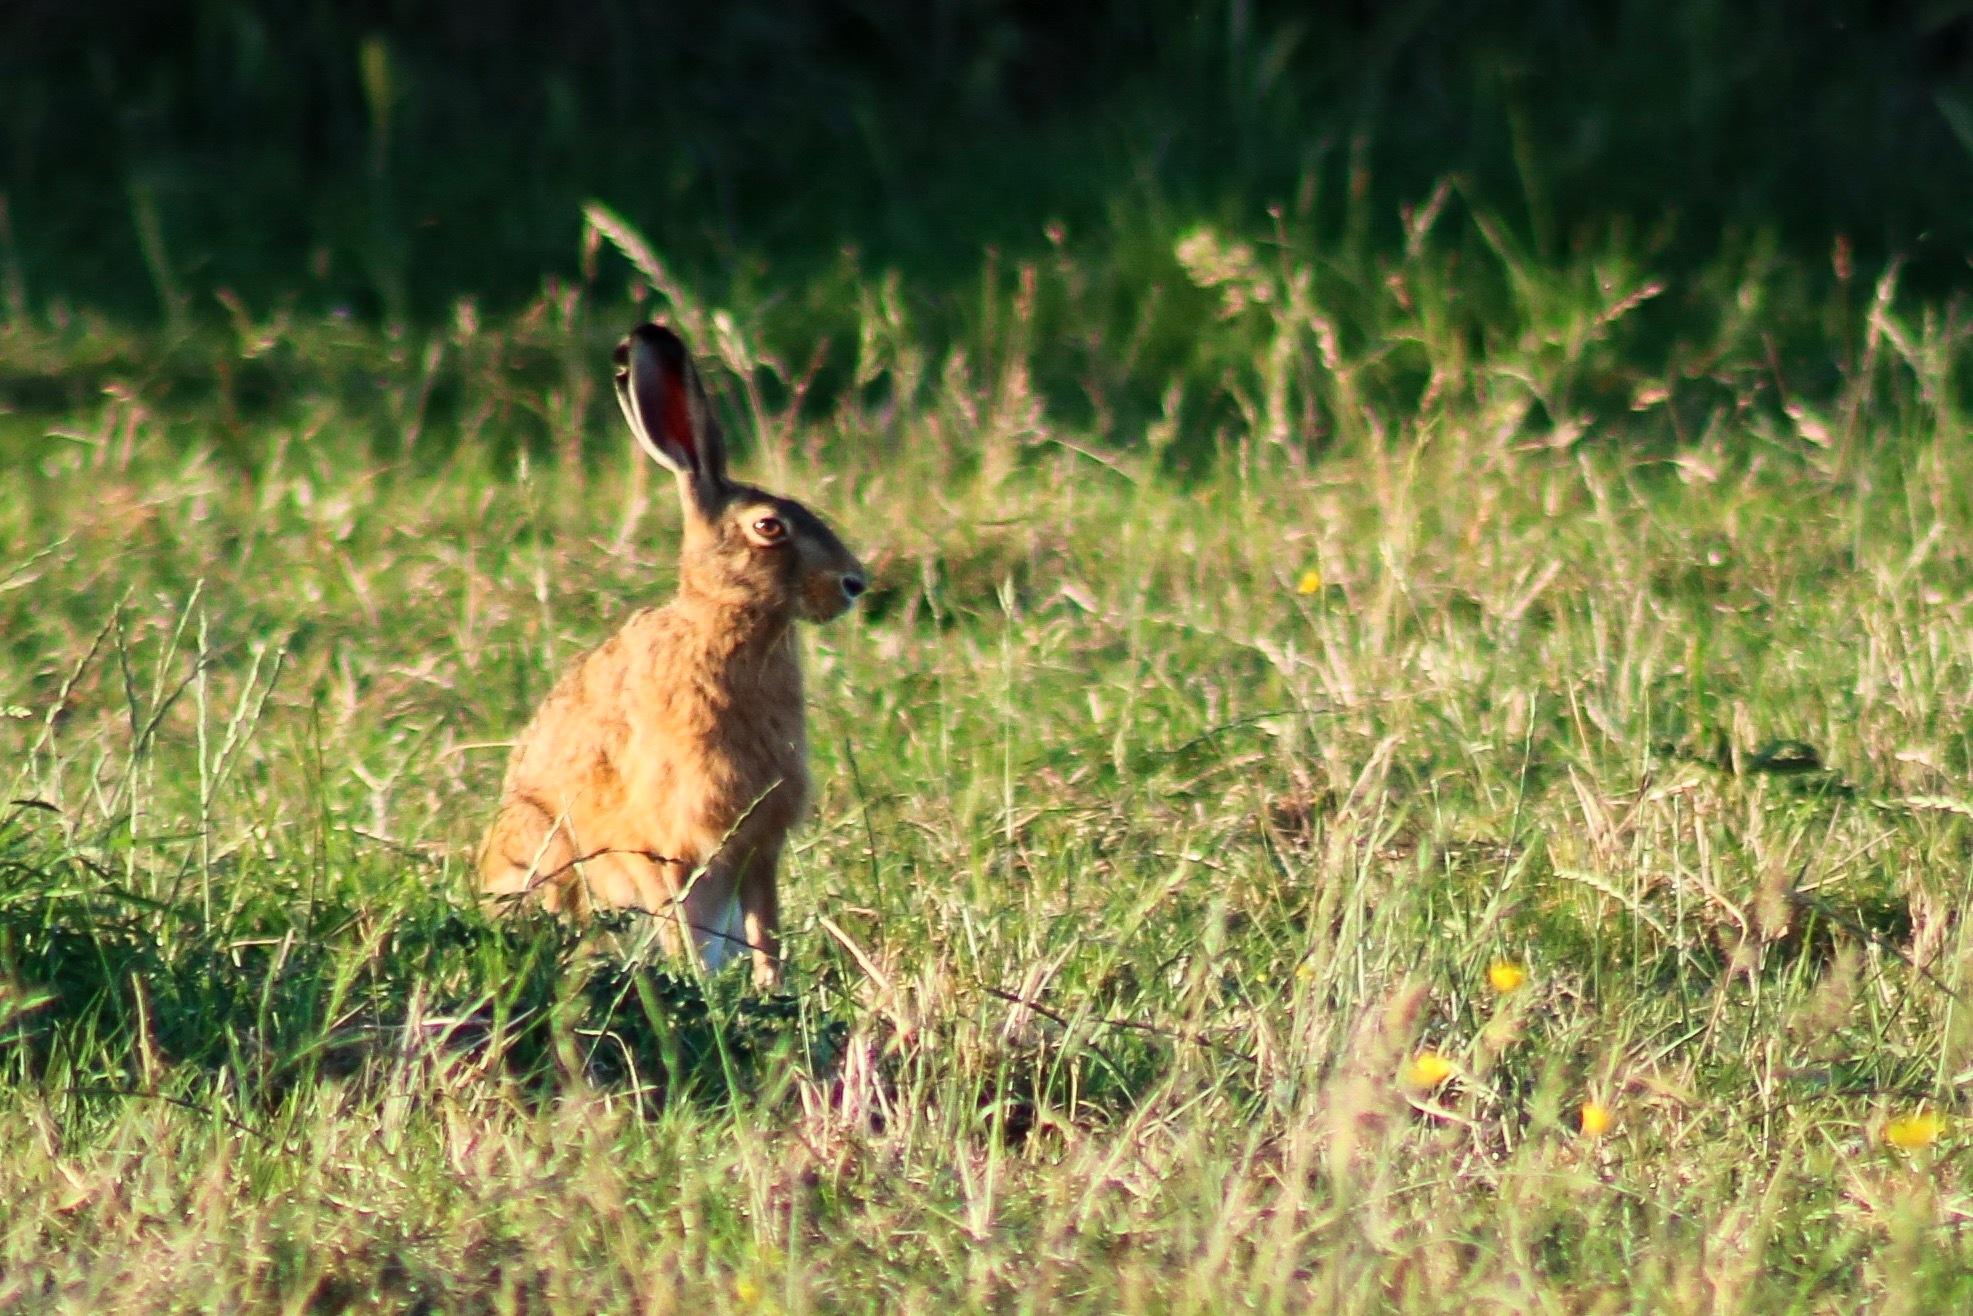 Hare by Ivan Samoshko